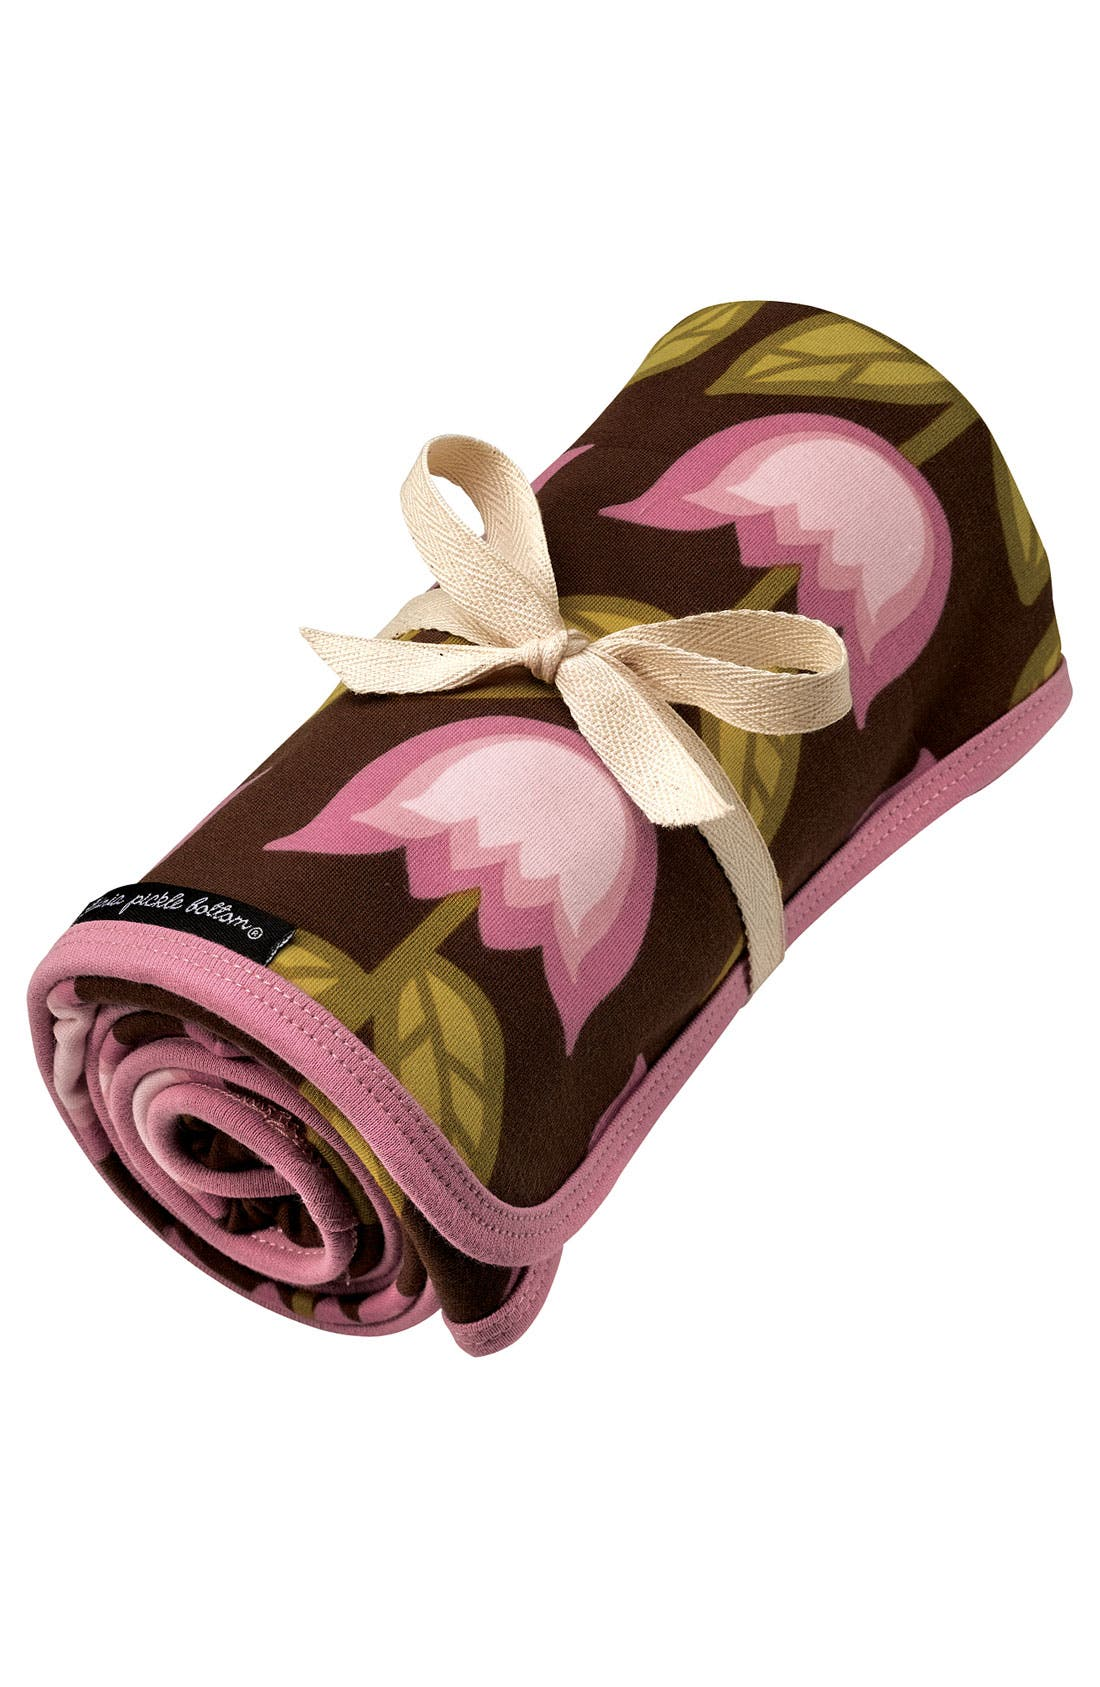 Alternate Image 1 Selected - Petunia Pickle Bottom Organic Cotton Stroller Blanket (Infant)